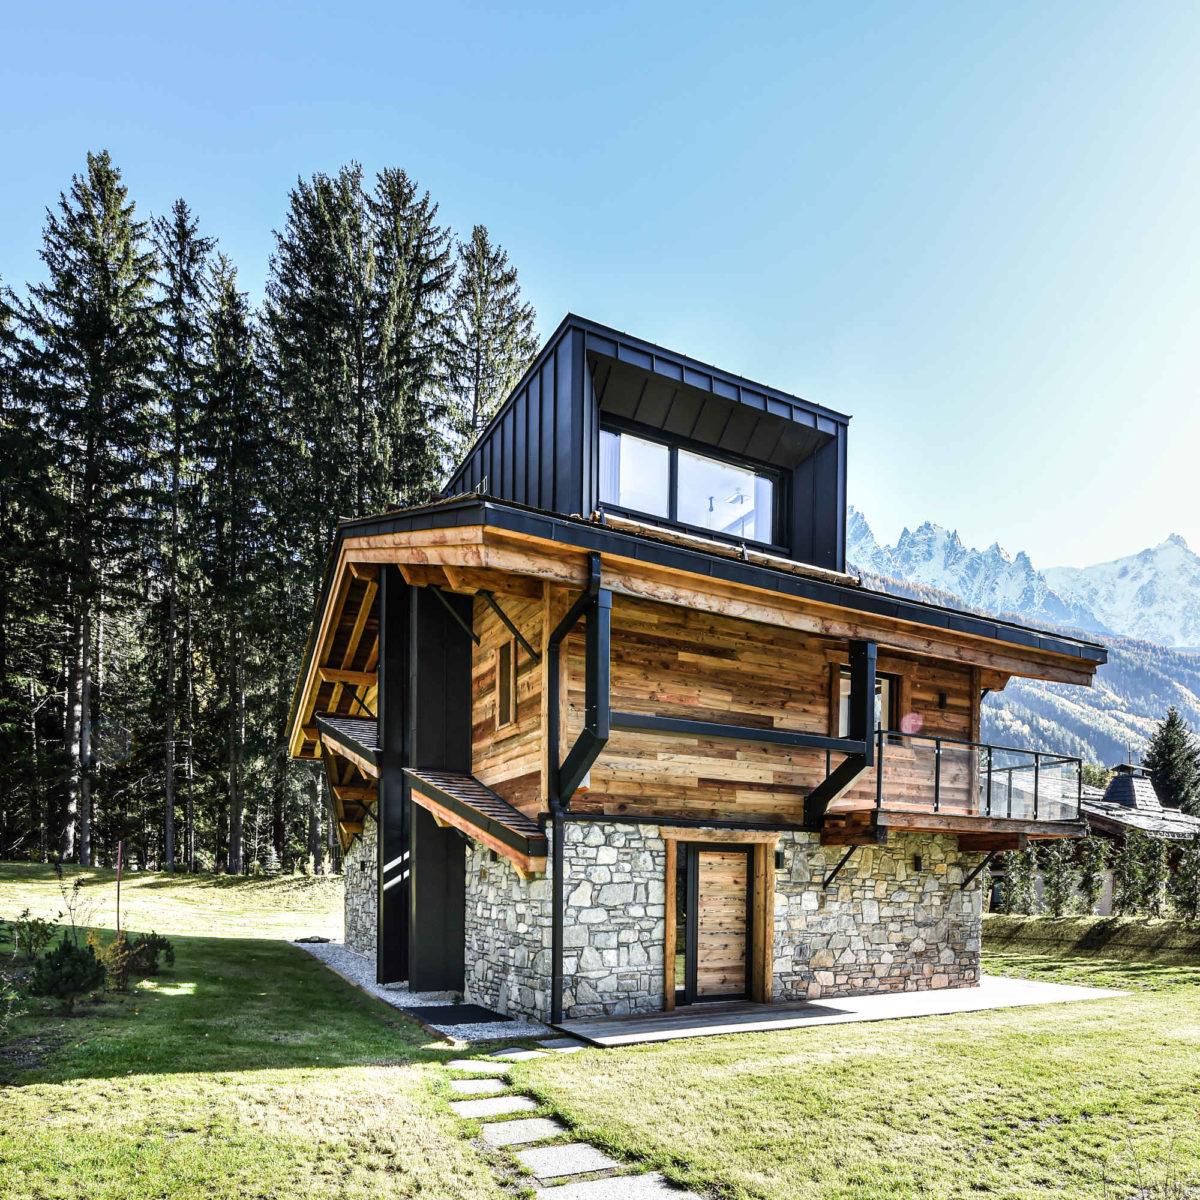 https://chevallier-architectes.fr/content/uploads/2020/03/DSC_0239-1200x1200.jpg